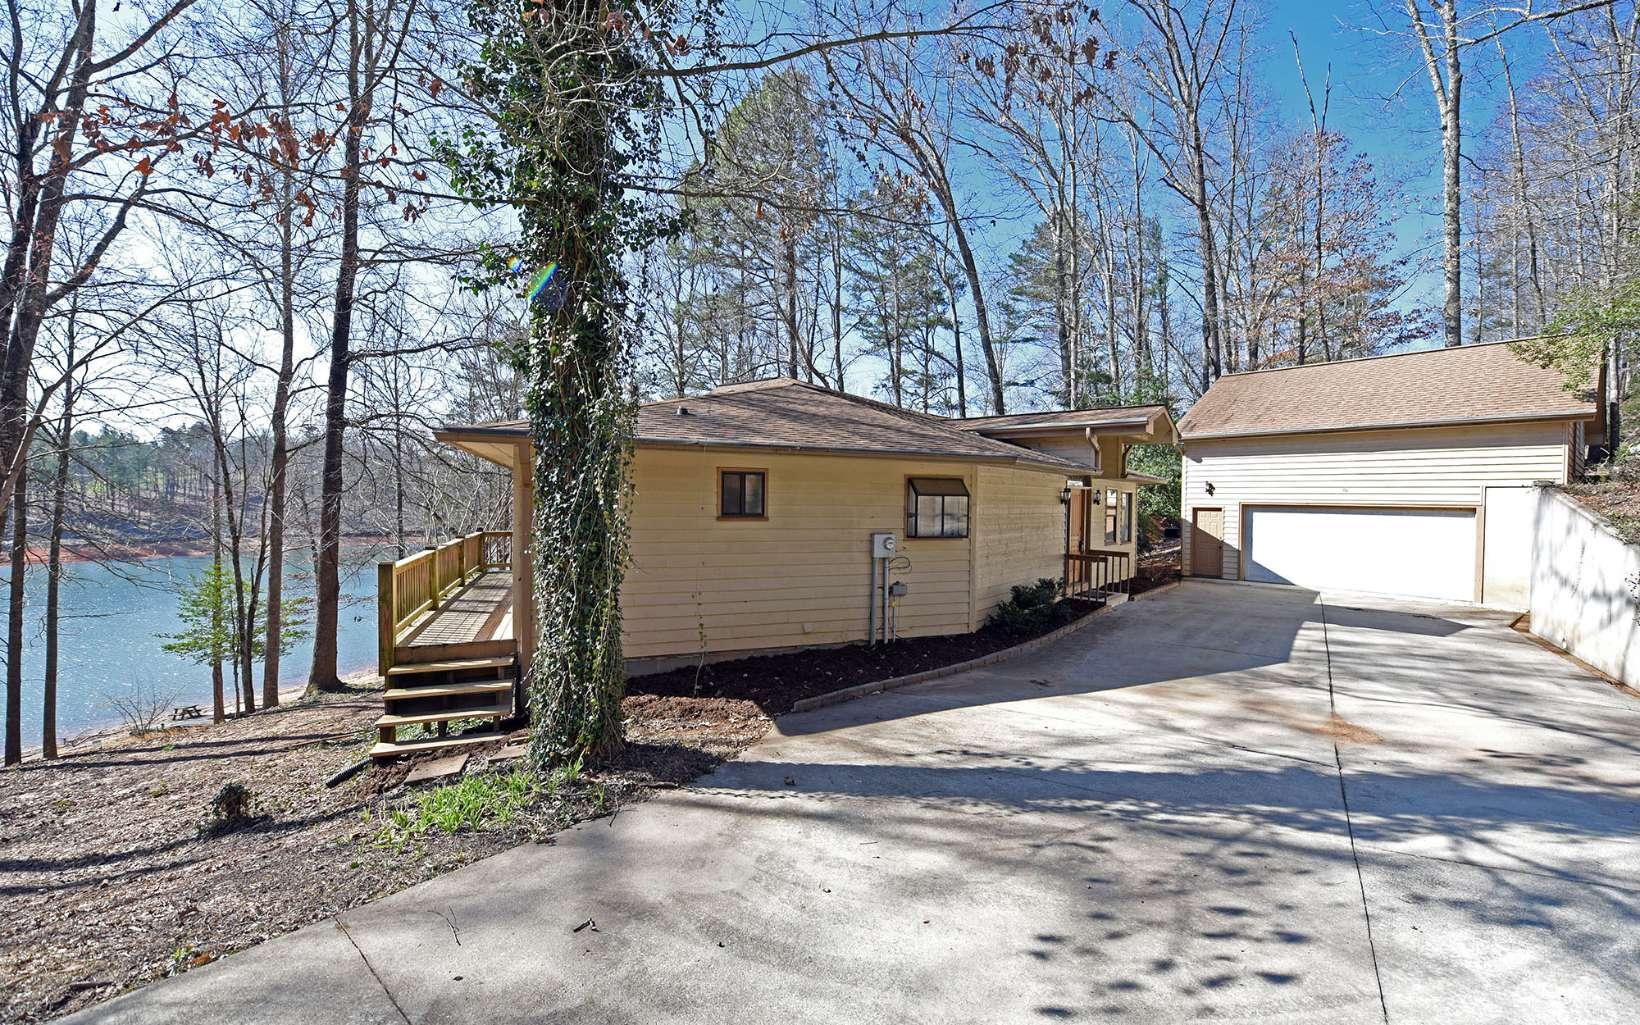 280020 Blairsville Residential